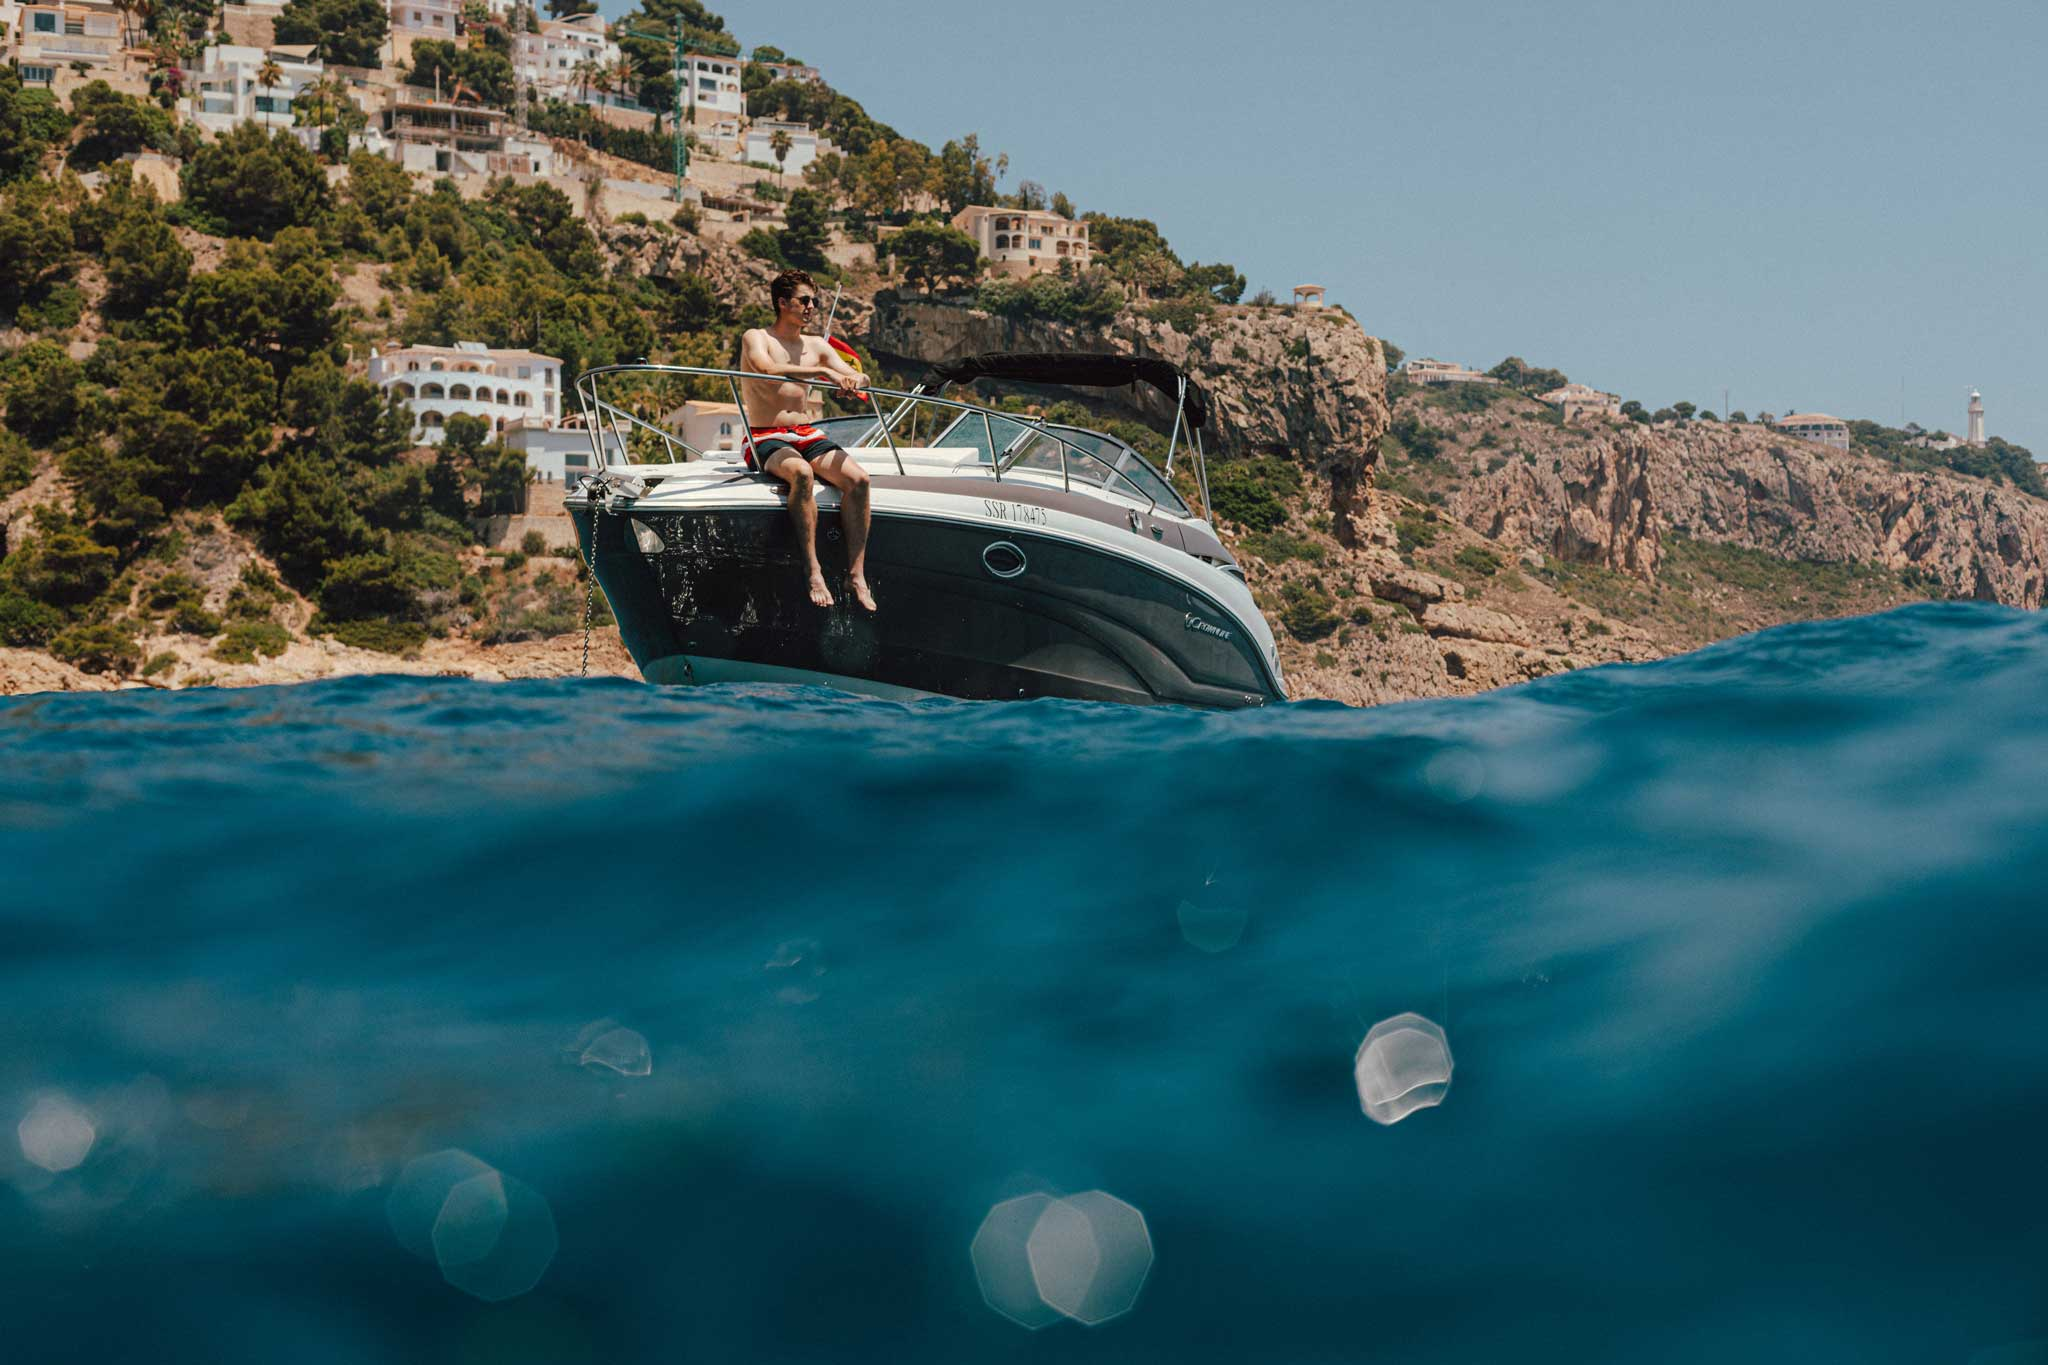 Alquiler de barcos en Denia – Restaurante Nomada